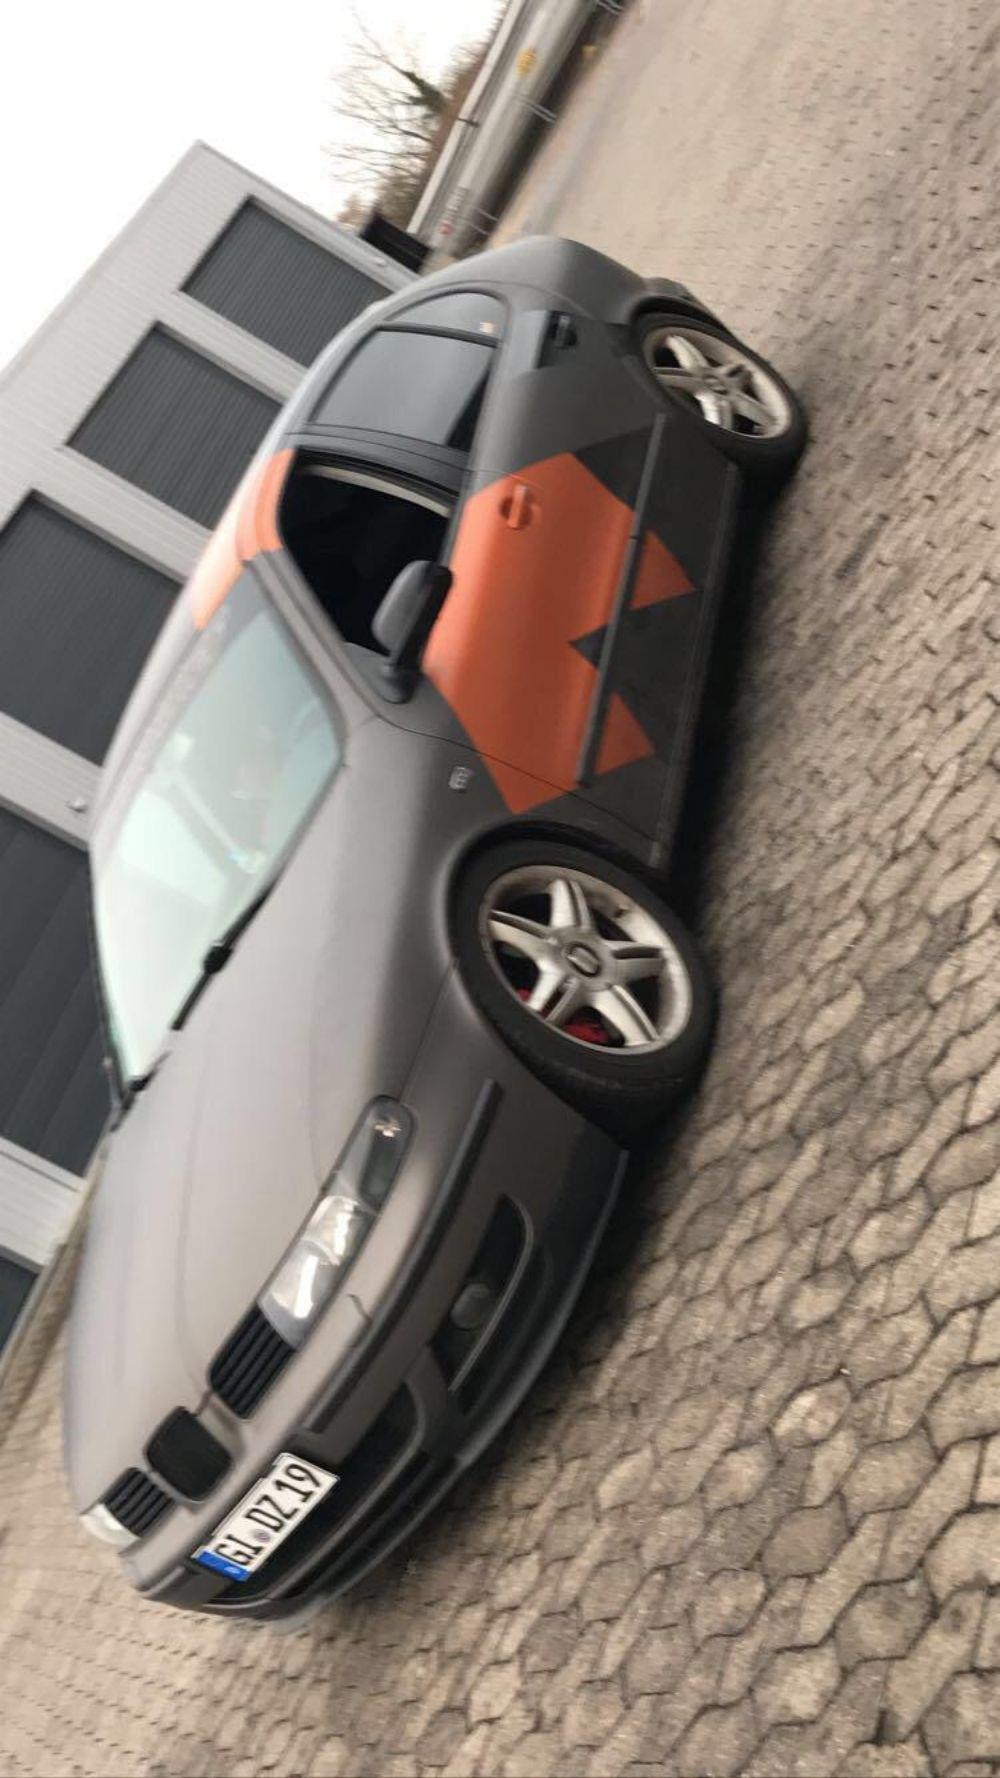 Seat leon 1.8 turbo